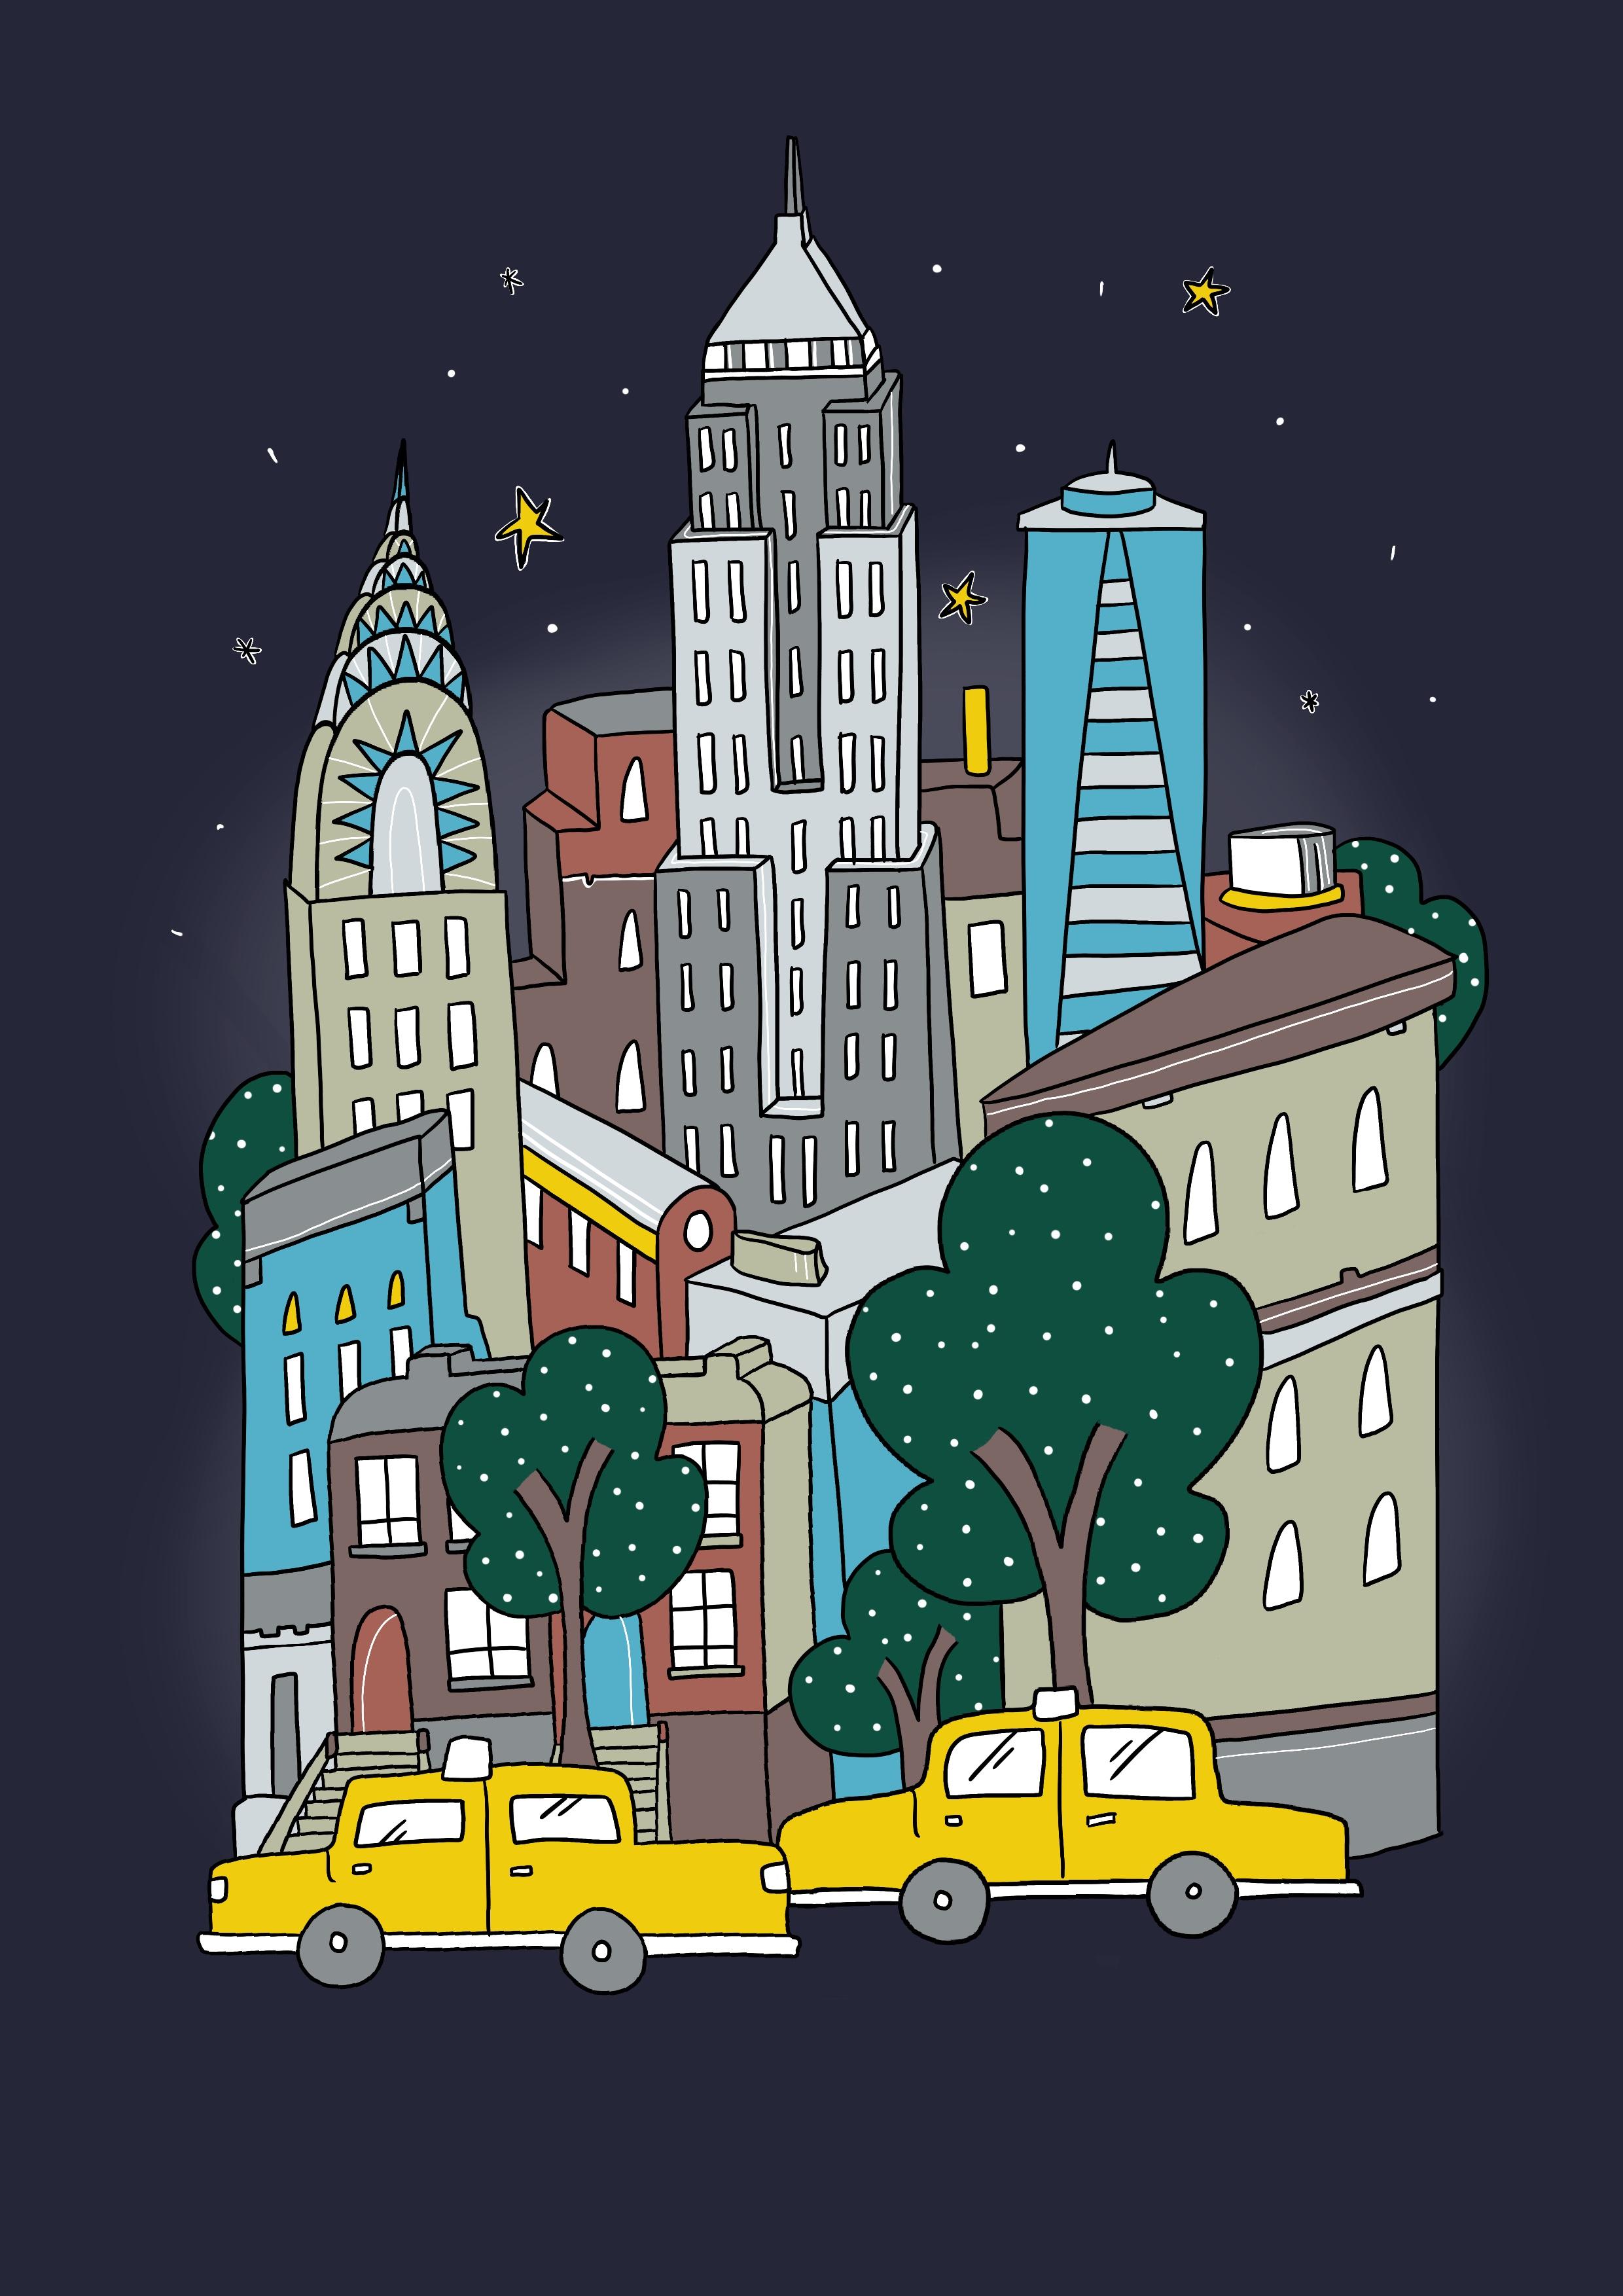 NYC_MeganMcKean.jpg